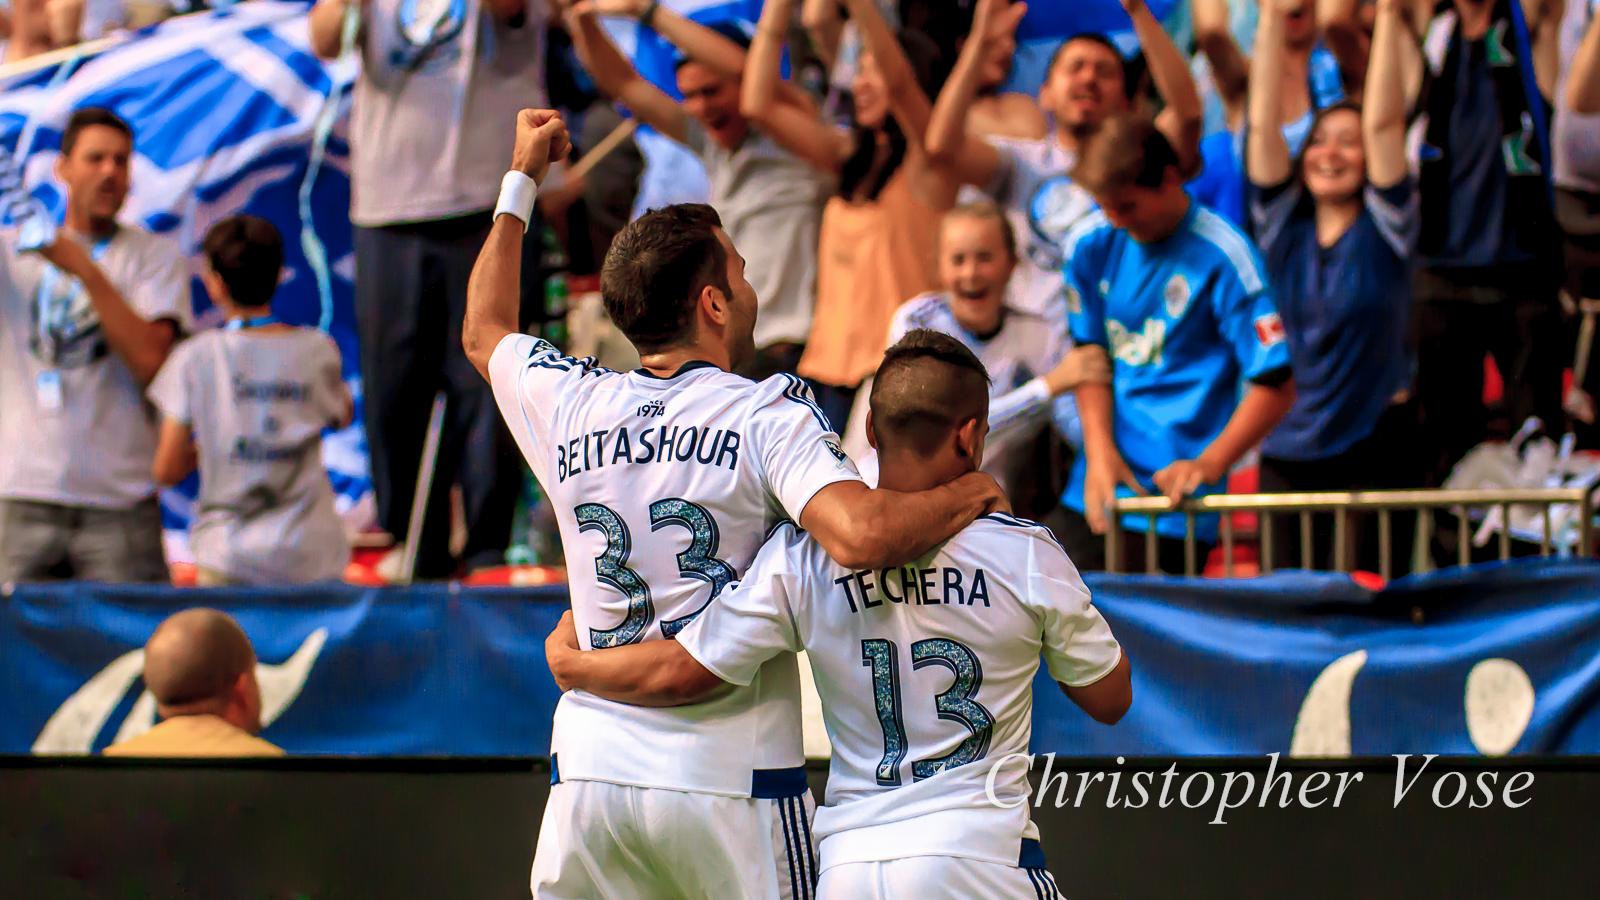 2015-08-22 Cristian Techera Goal Celebration 1.jpg